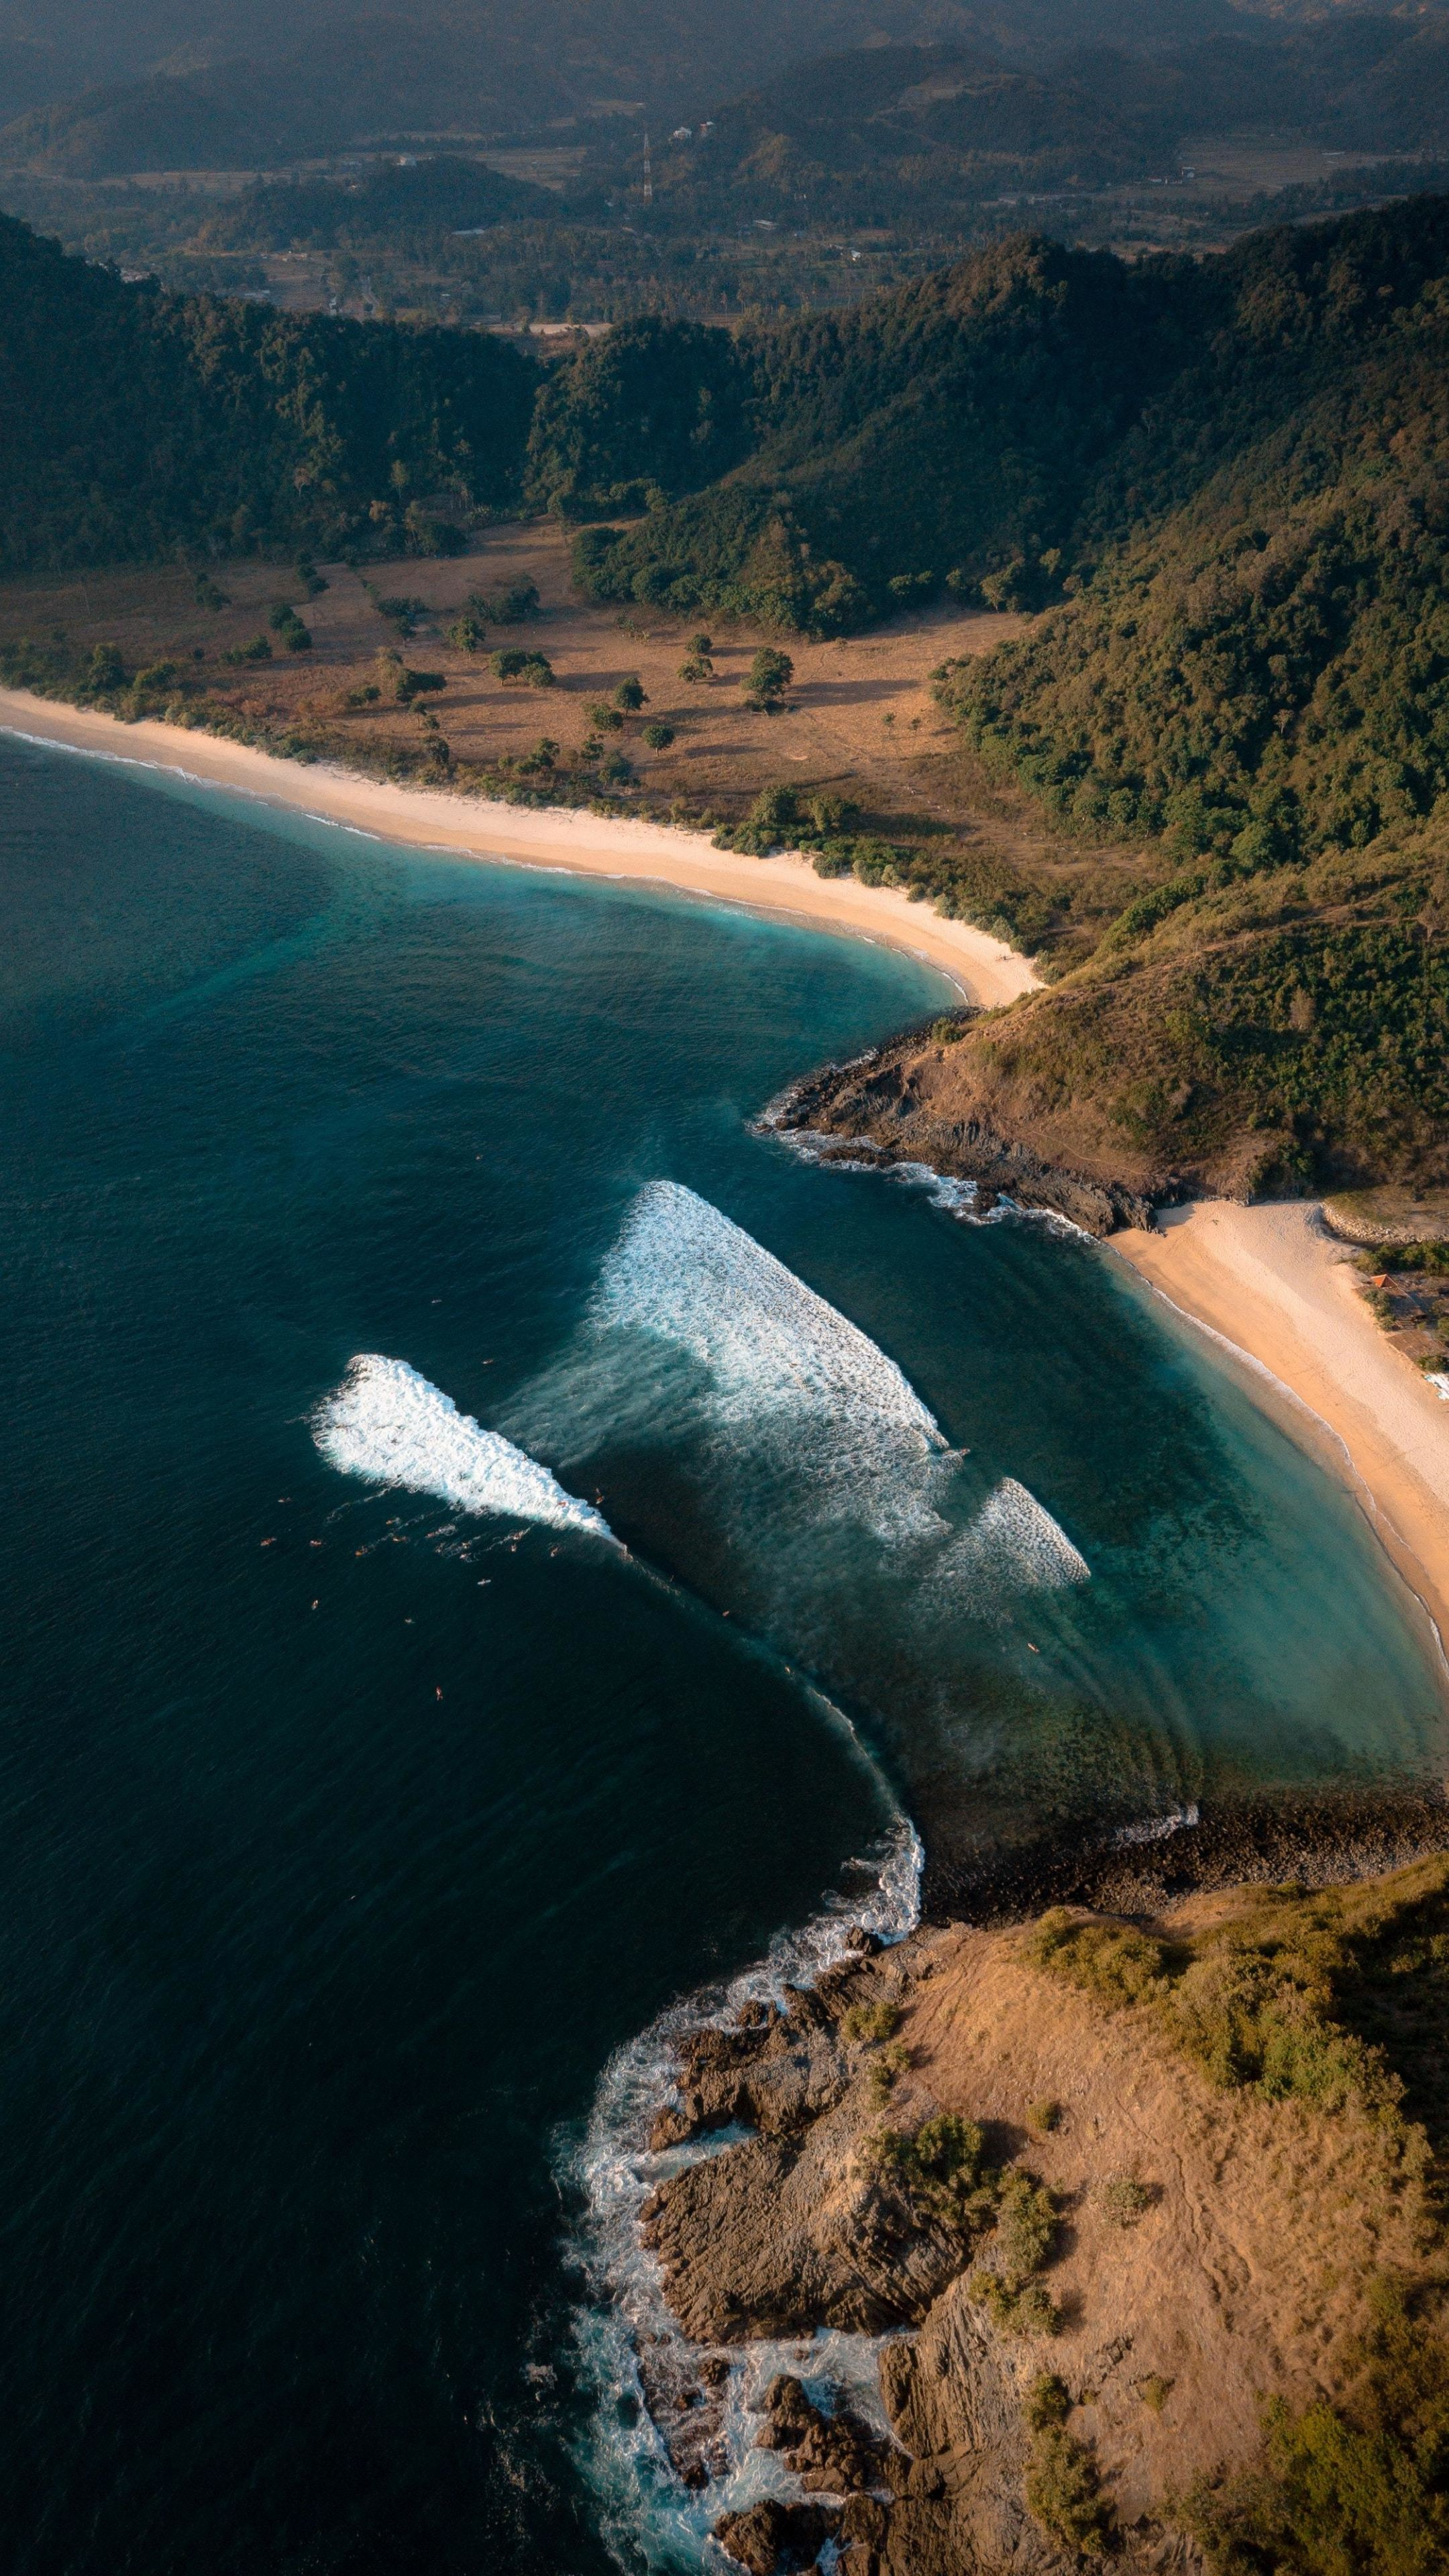 2160x3840 Aerial View Beach Sea Landscape Wallpaper In 2020 Beach Landscape Hd Landscape Landscape Wallpaper